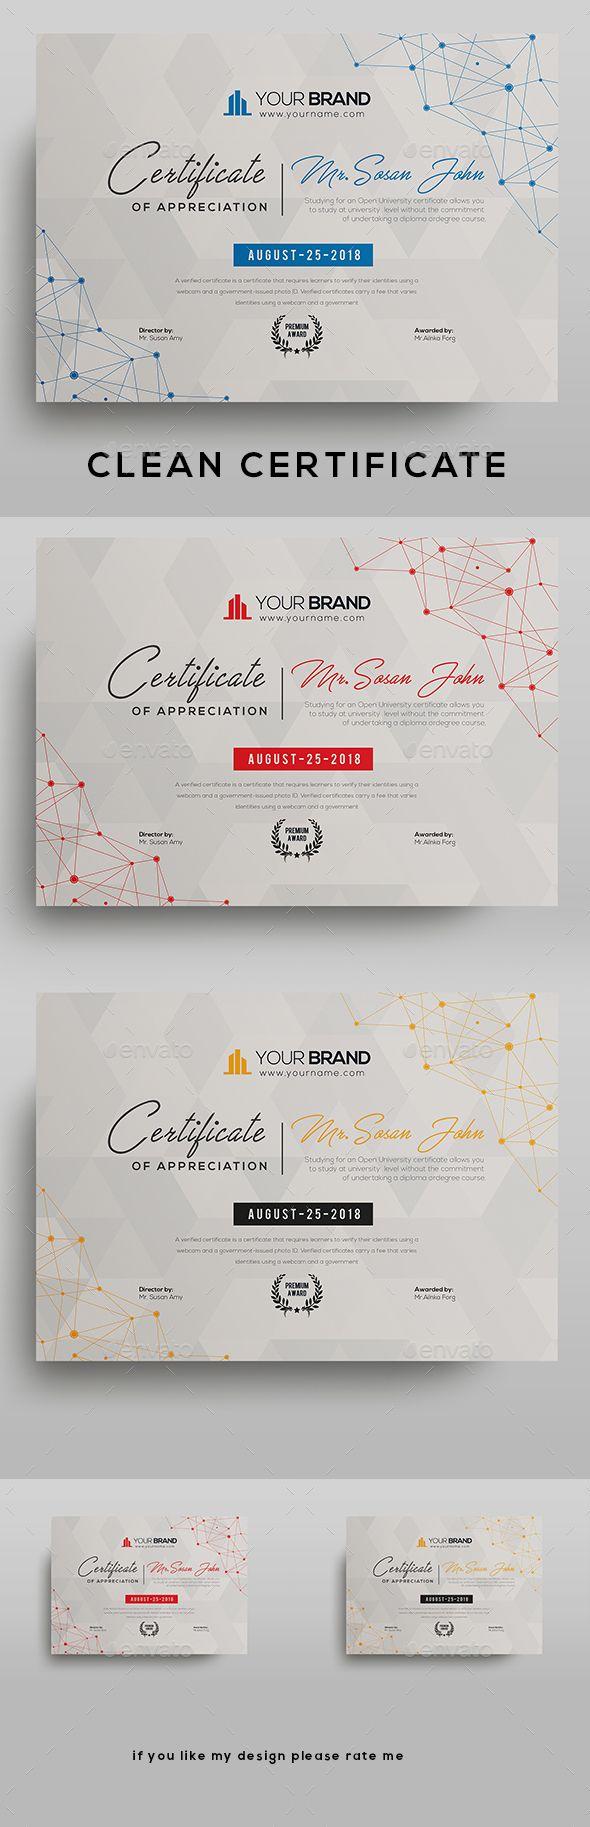 Multipurpose Certificates | Pinterest | Certificate and Template